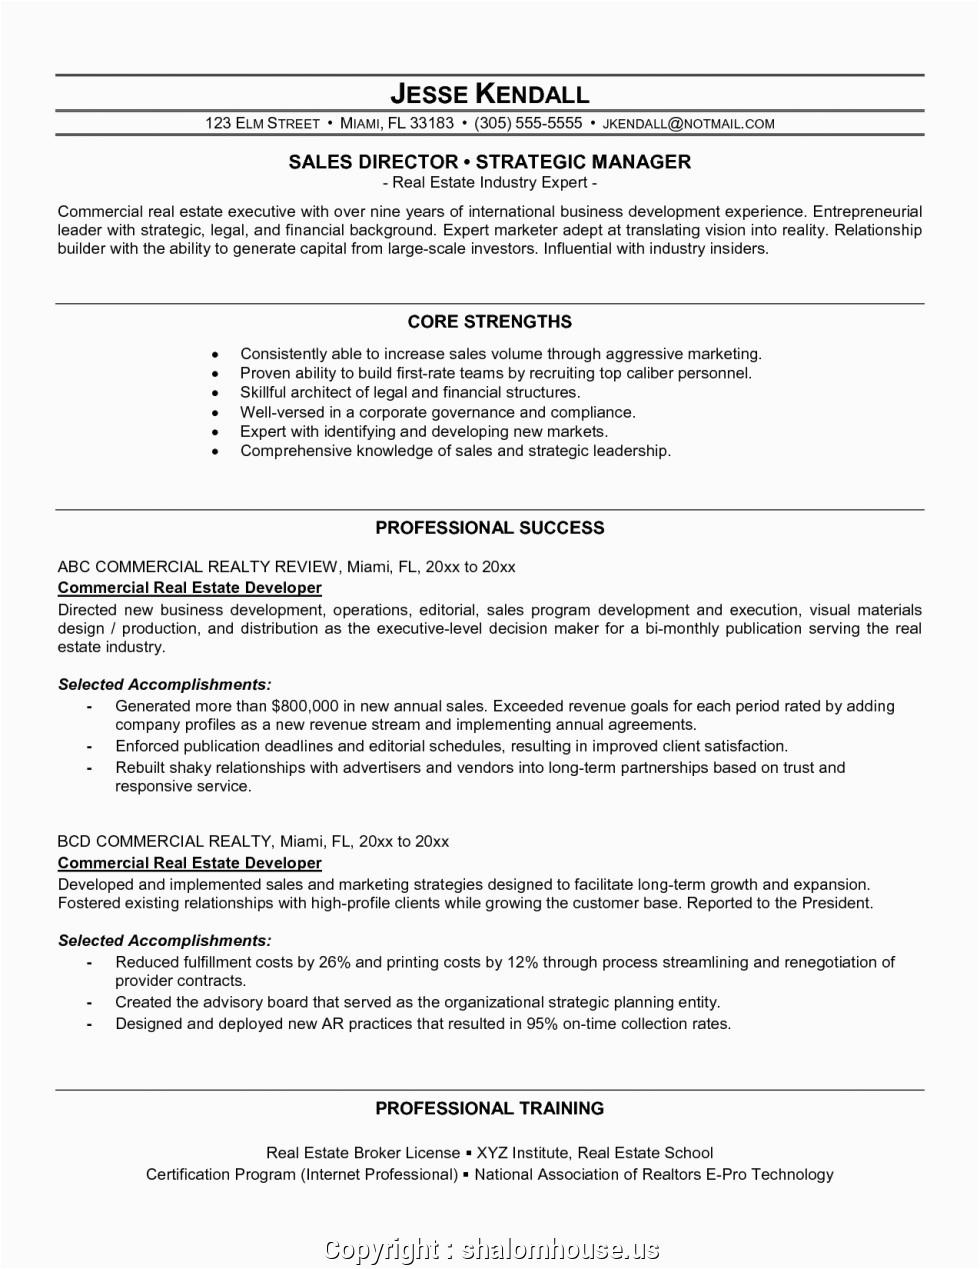 free real estate development resume sample